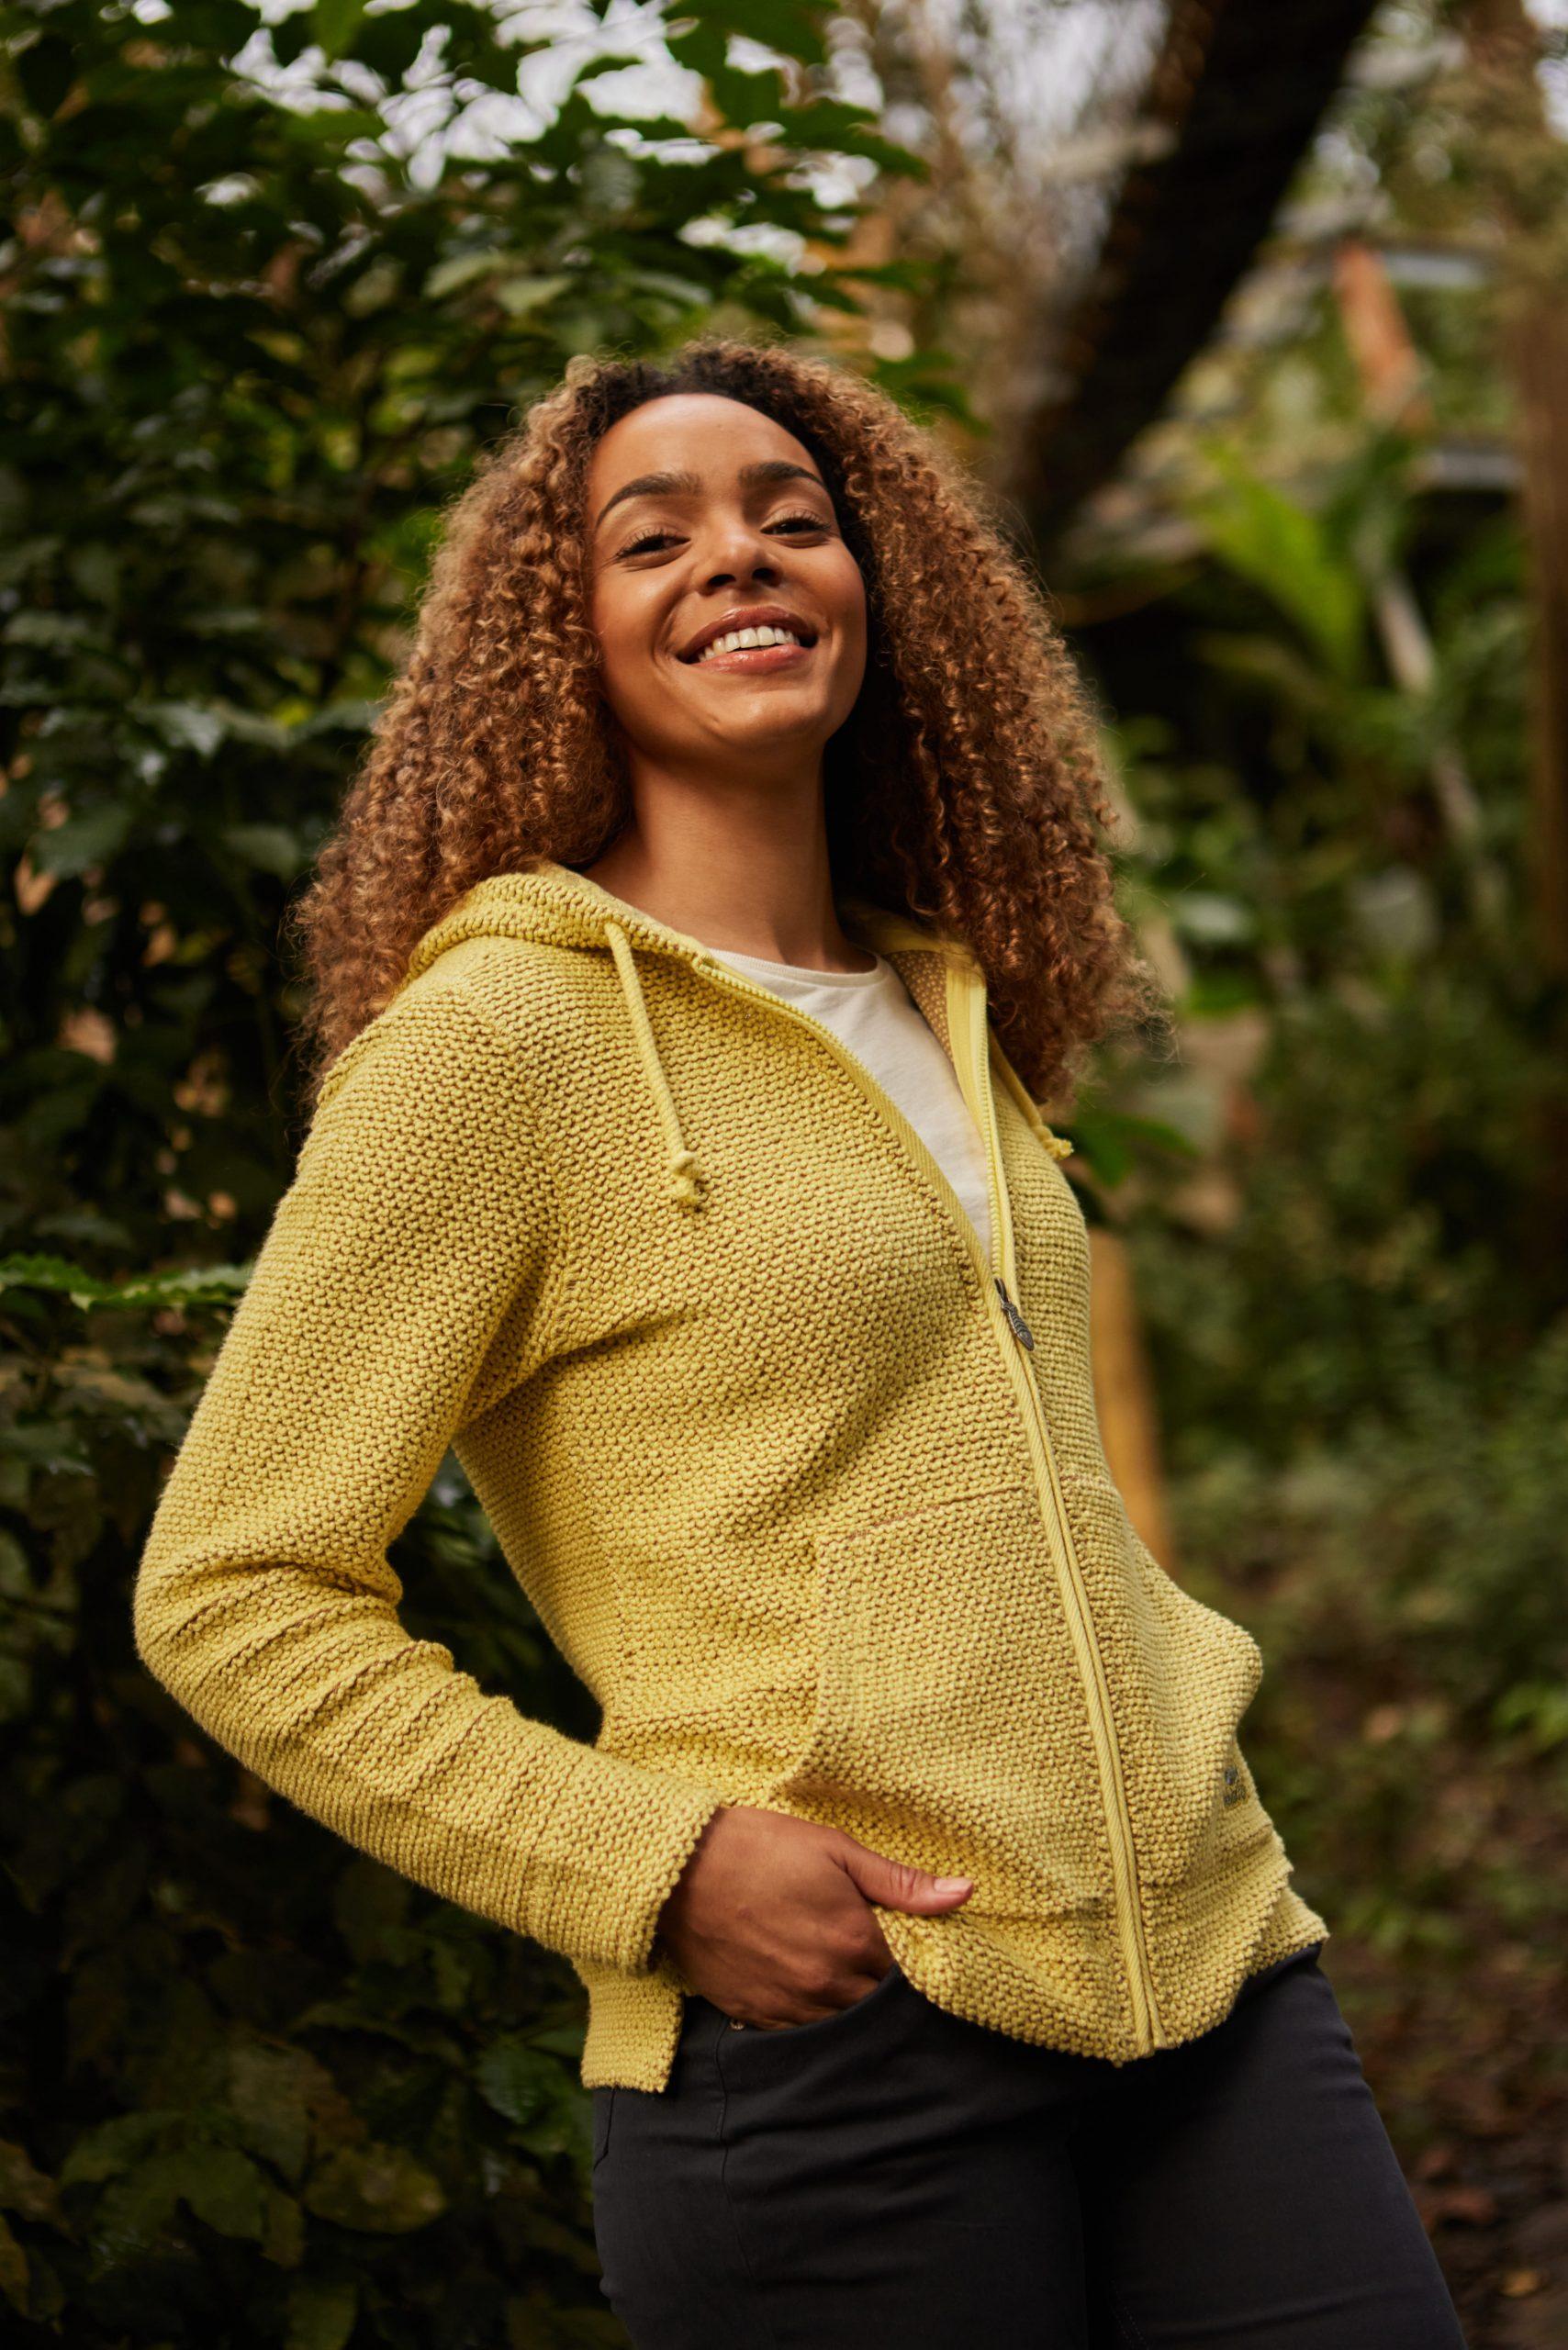 Women outdoors wearing a yellow jacket